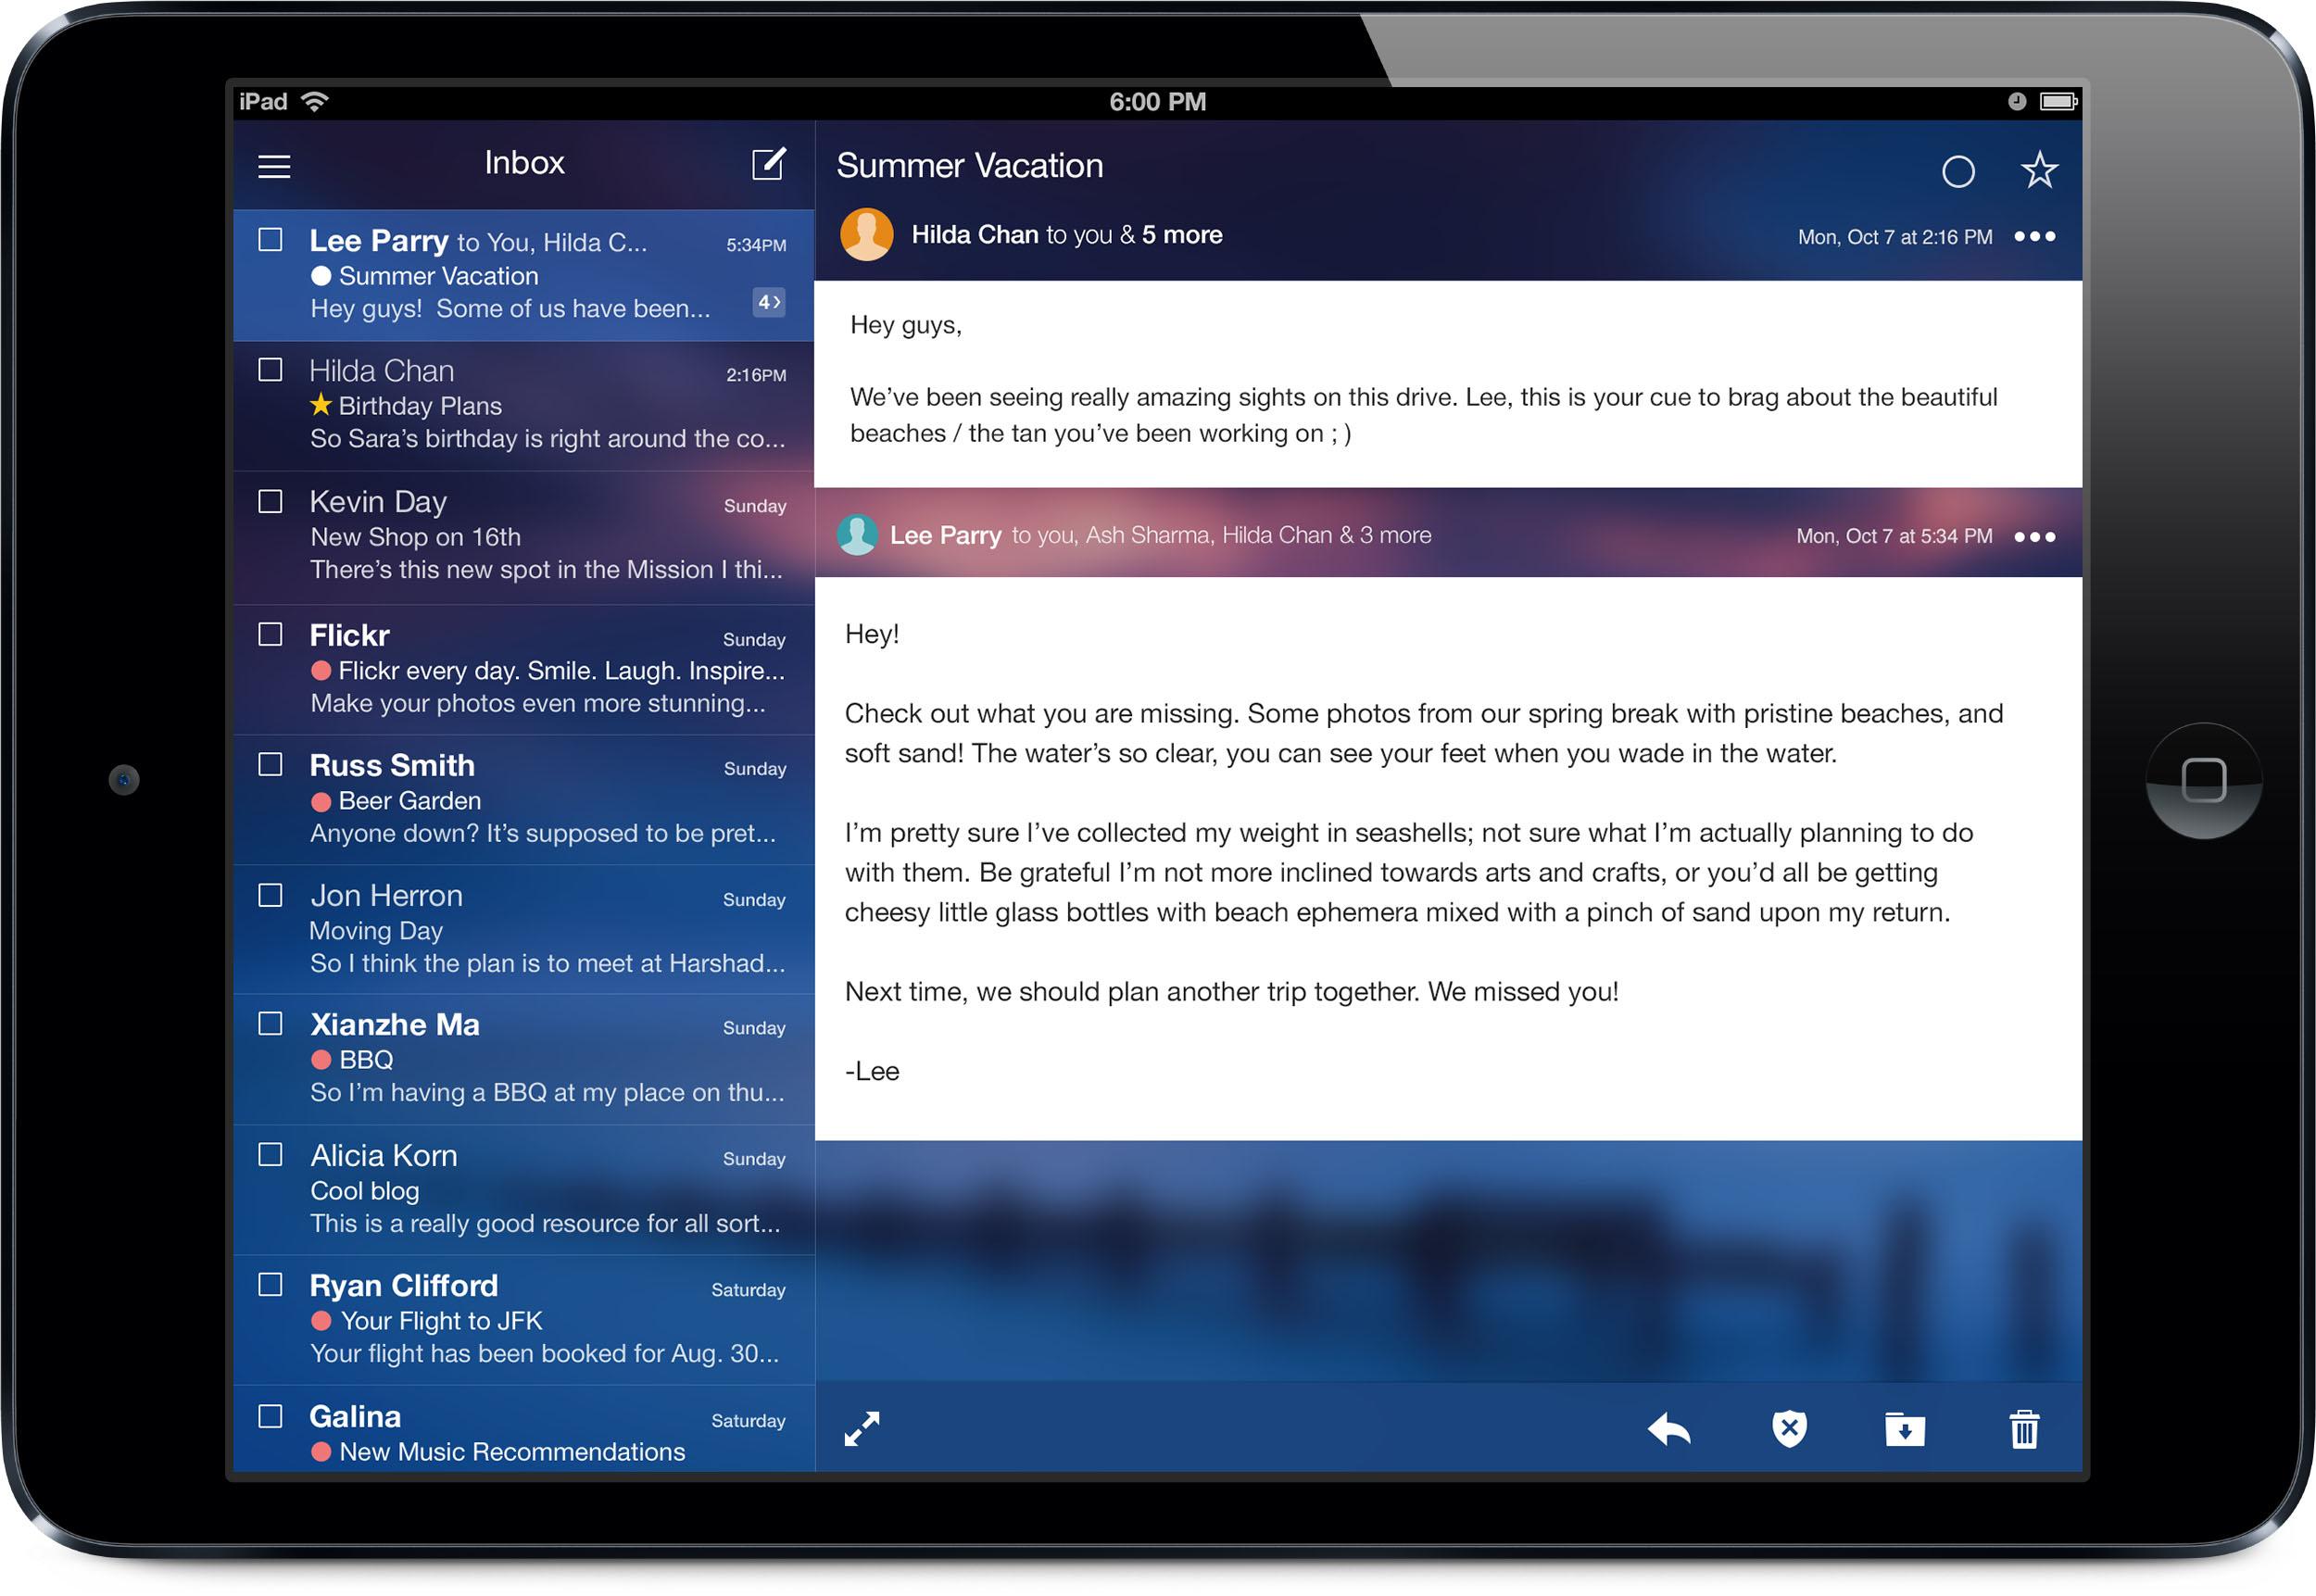 Yahoo Mail Gets Cross-Platform Themes, 1TB of Storage, 'Mail Plus